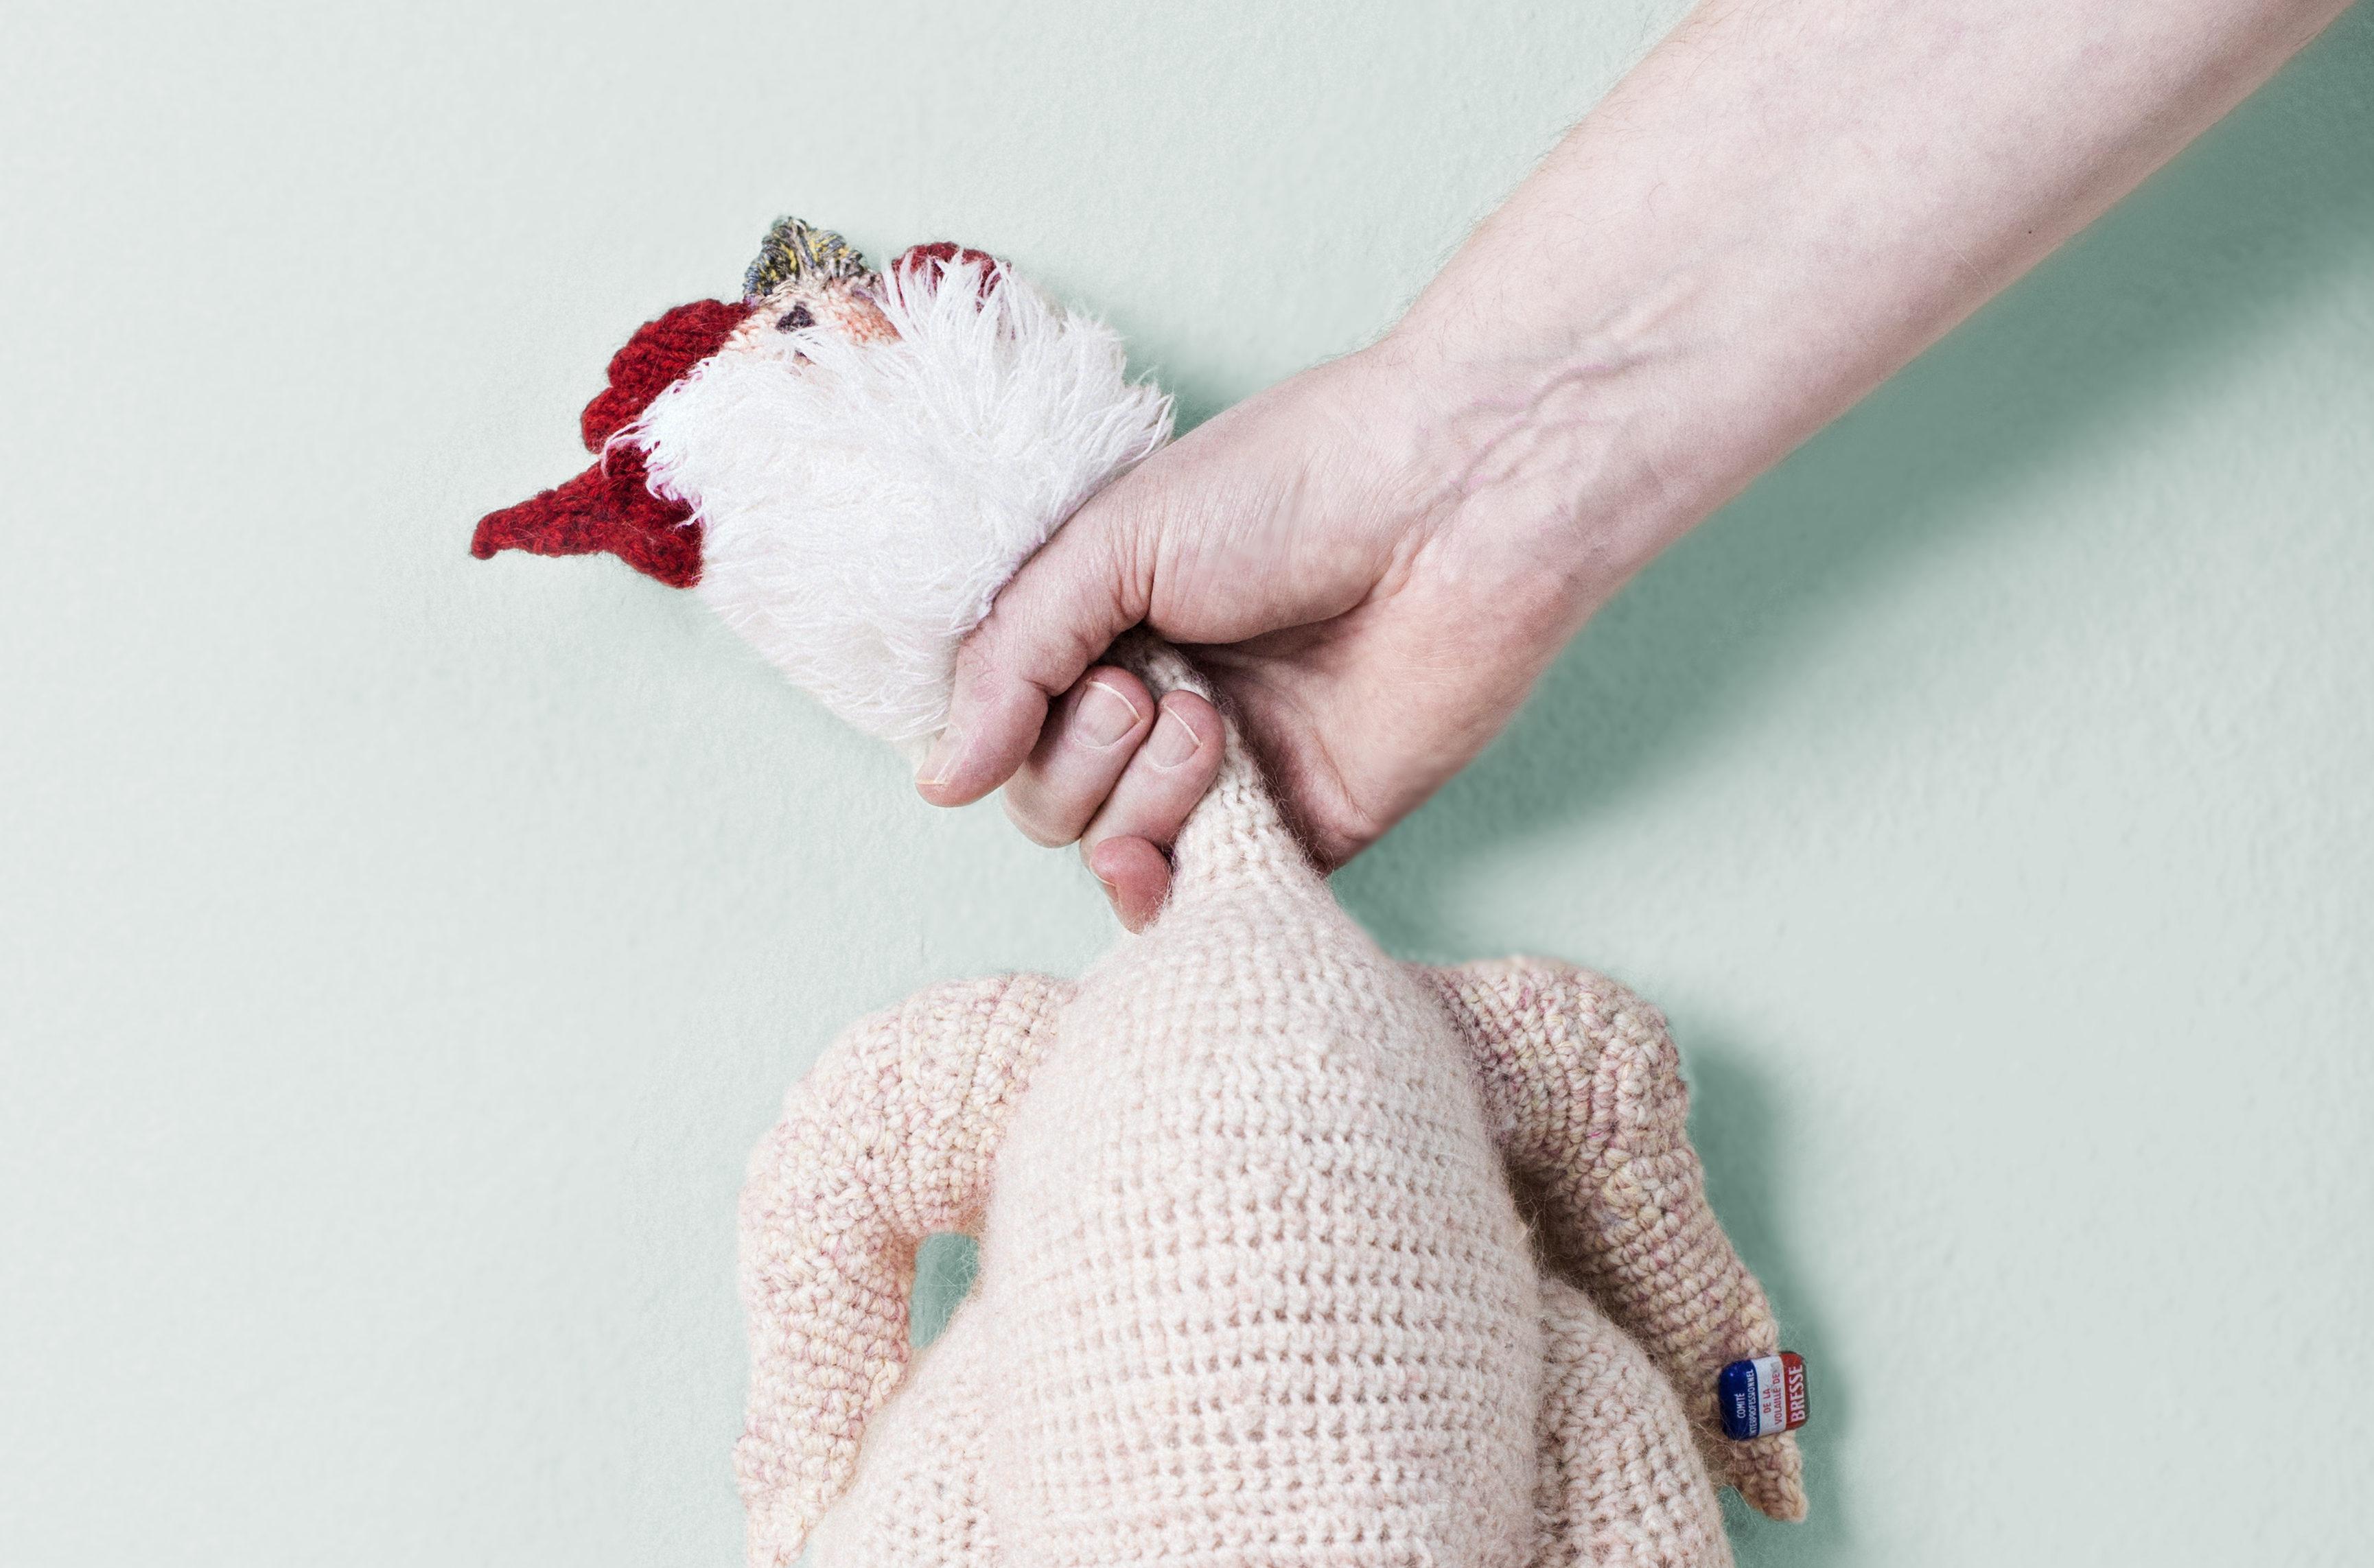 Diesem Huhn gehts an die Gurgel. (Bild: Mojca Vidmar)